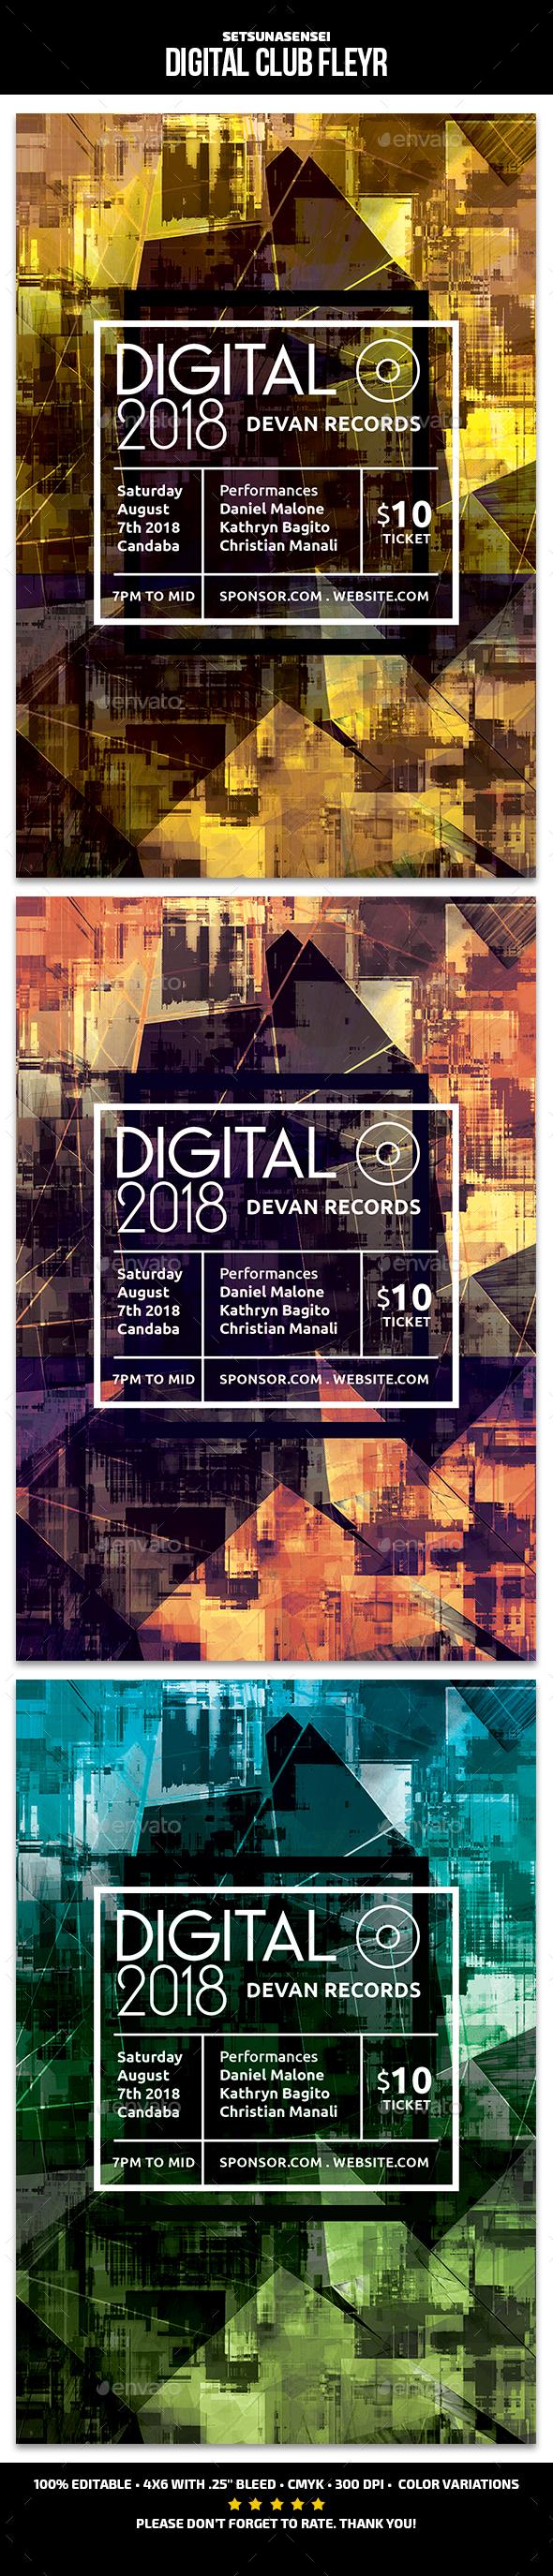 Digital Club Flyer - Events Flyers